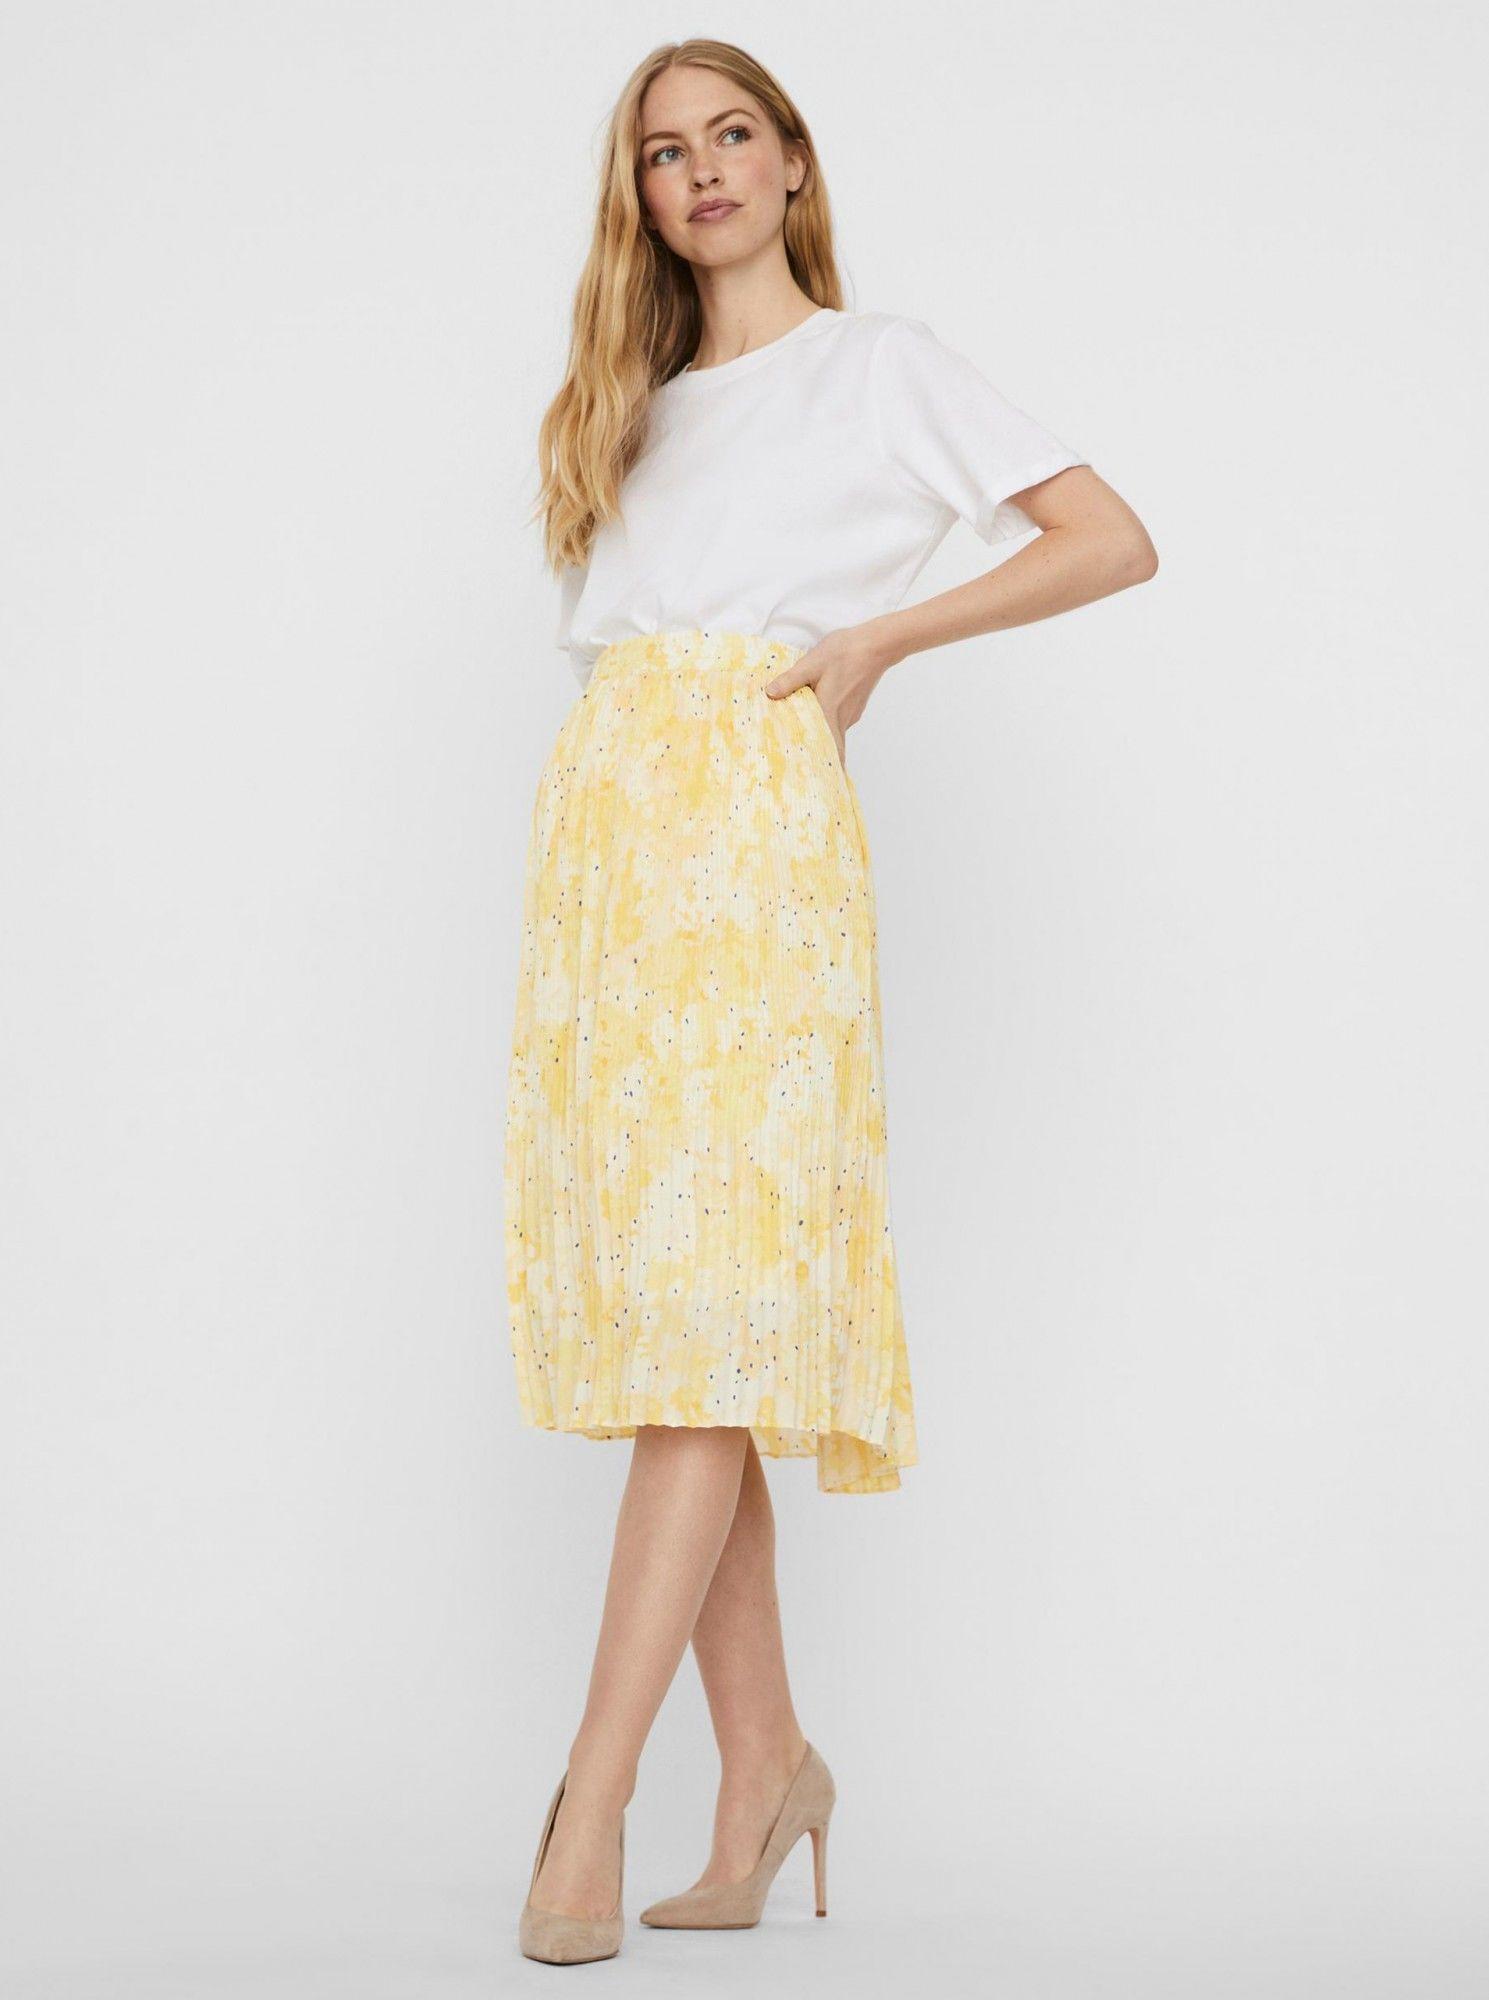 Vero Moda Vero Moda żółty plisowana spódnica Flora